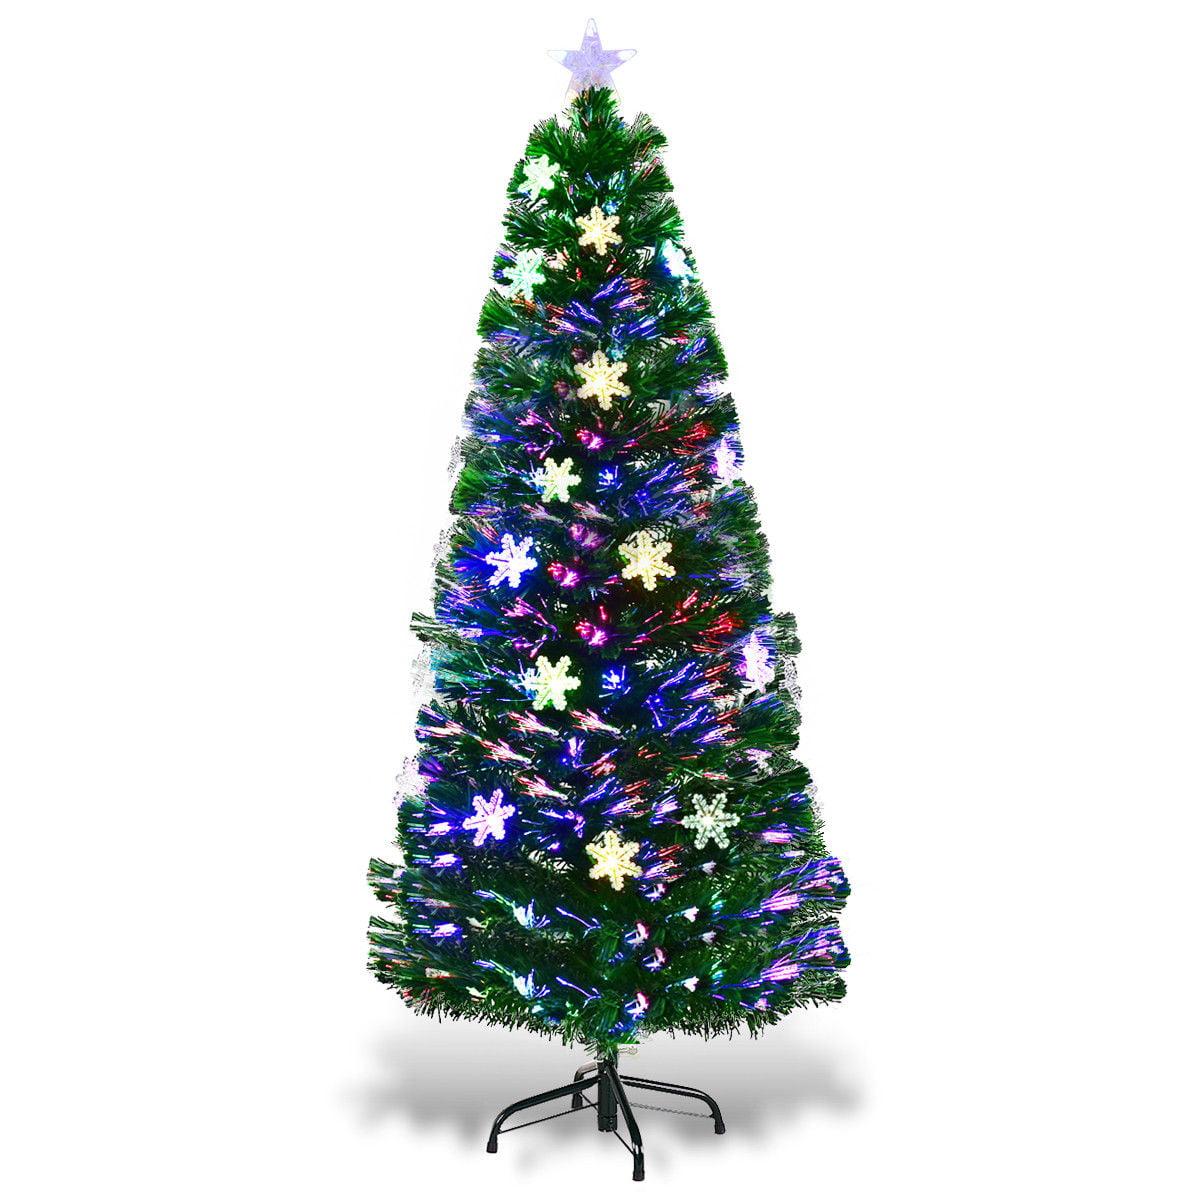 Costway 6FT Pre-Lit Fiber Optic Christmas Tree Multicolor Lights